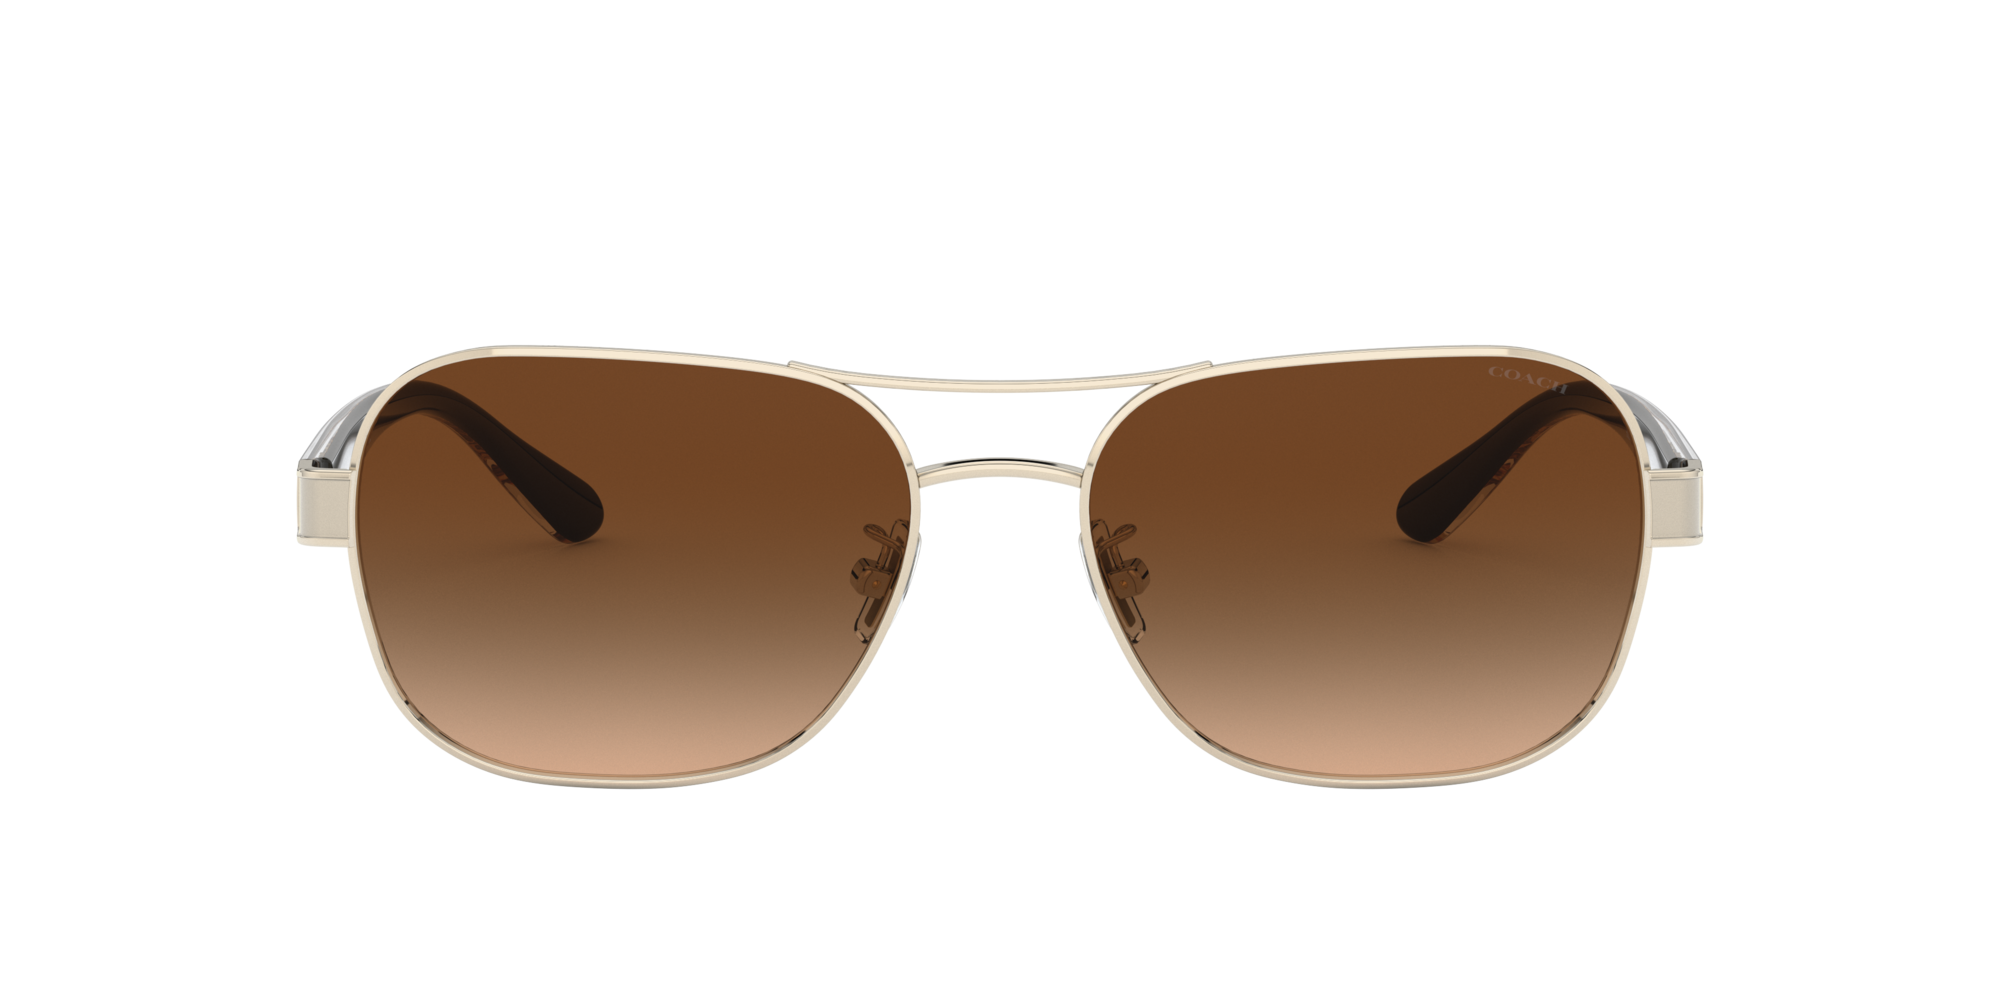 Image for L1151 from LensCrafters | Glasses, Prescription Glasses Online, Eyewear